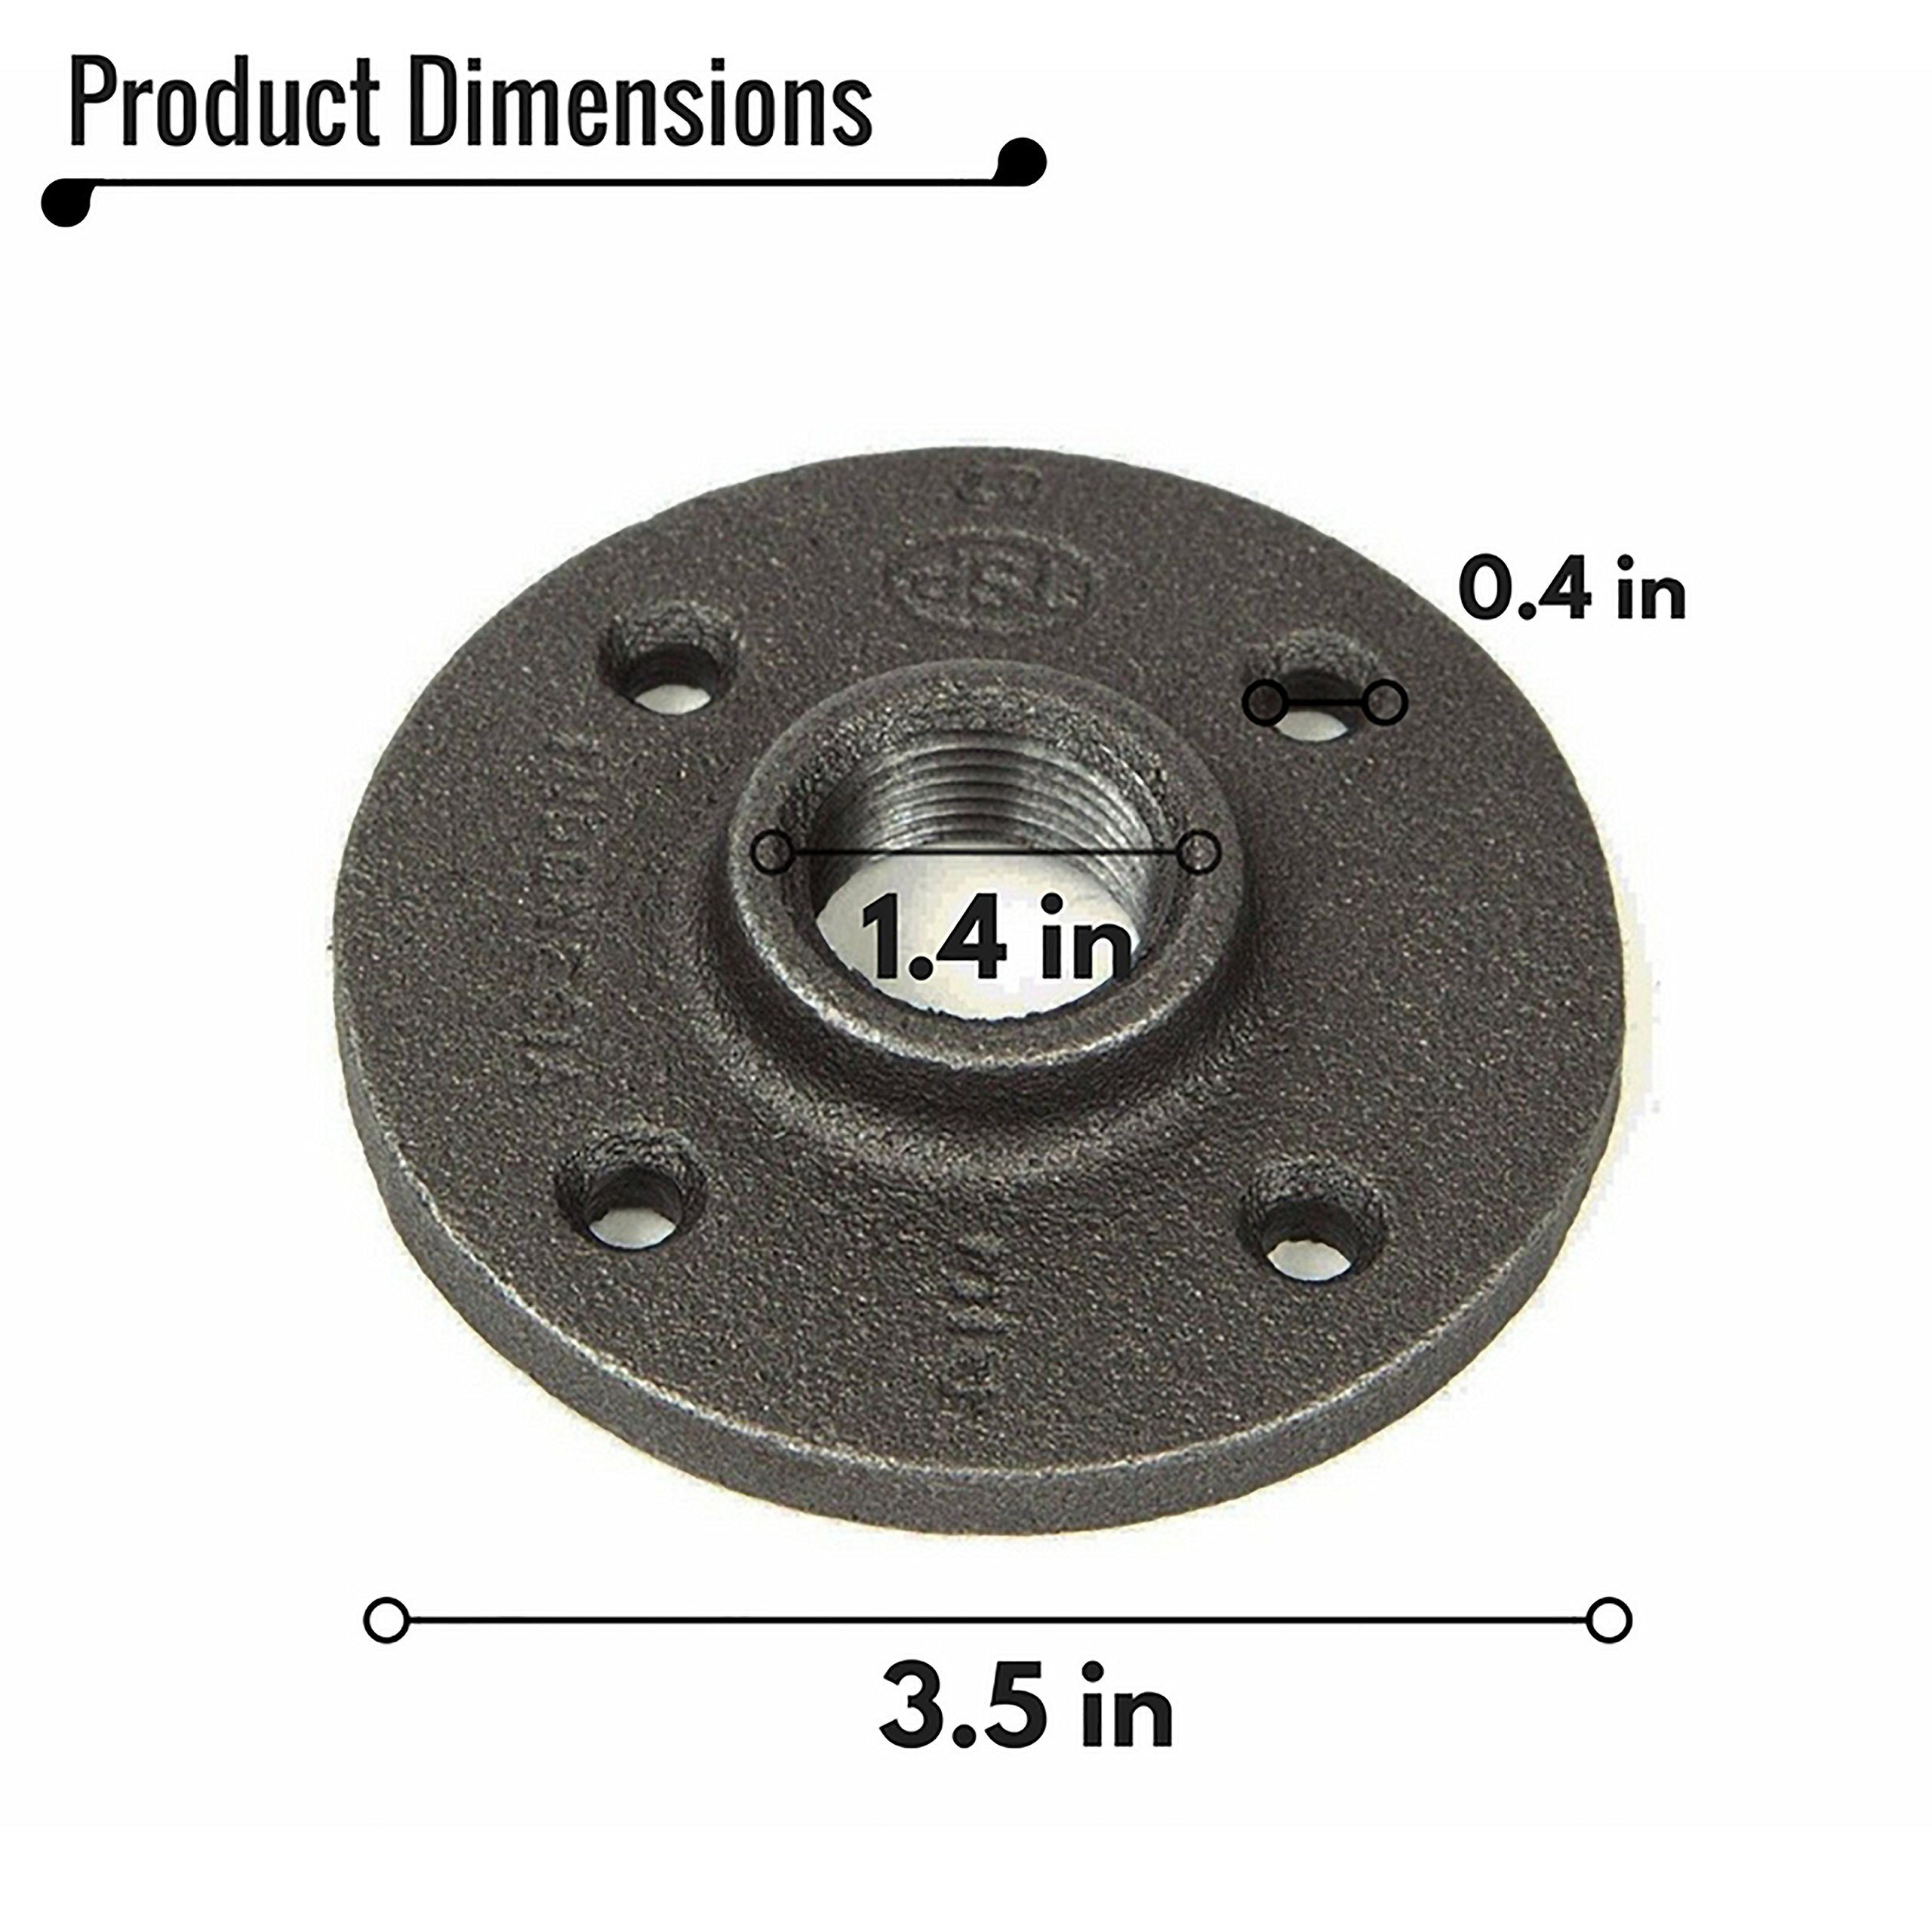 float bowl brass for floor plug lowbrow carburetors cad customs inch drain plated flange amal concentric